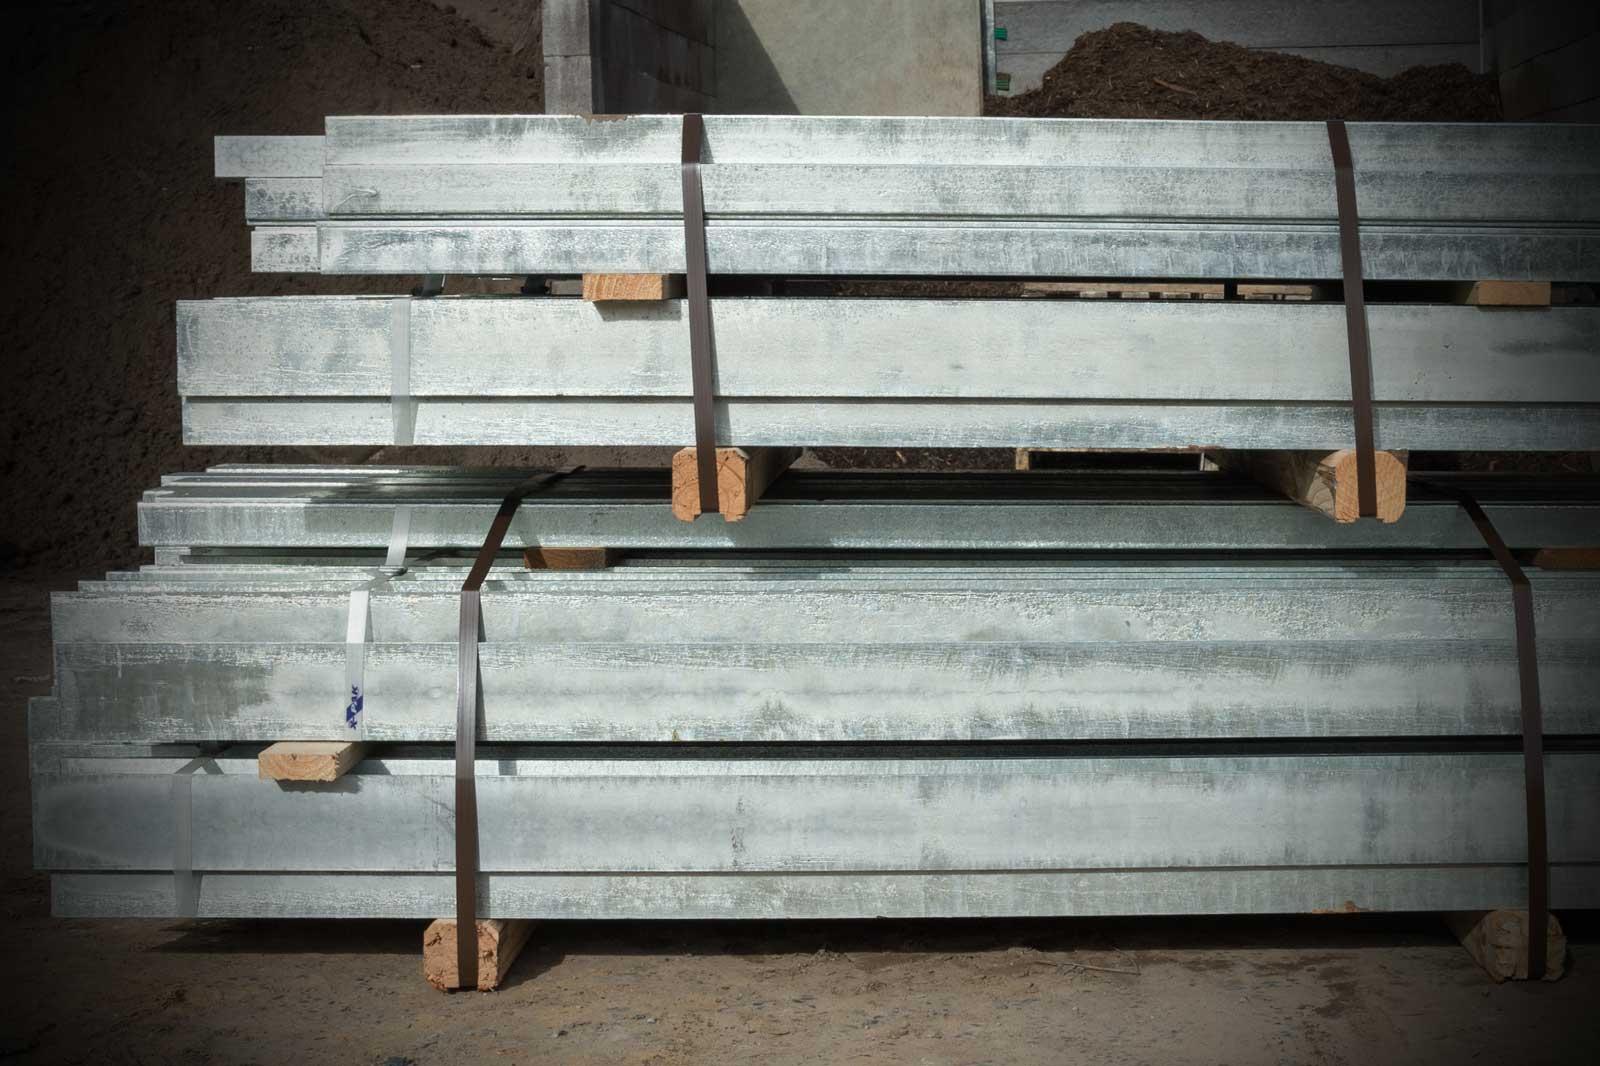 Retaining wall posts